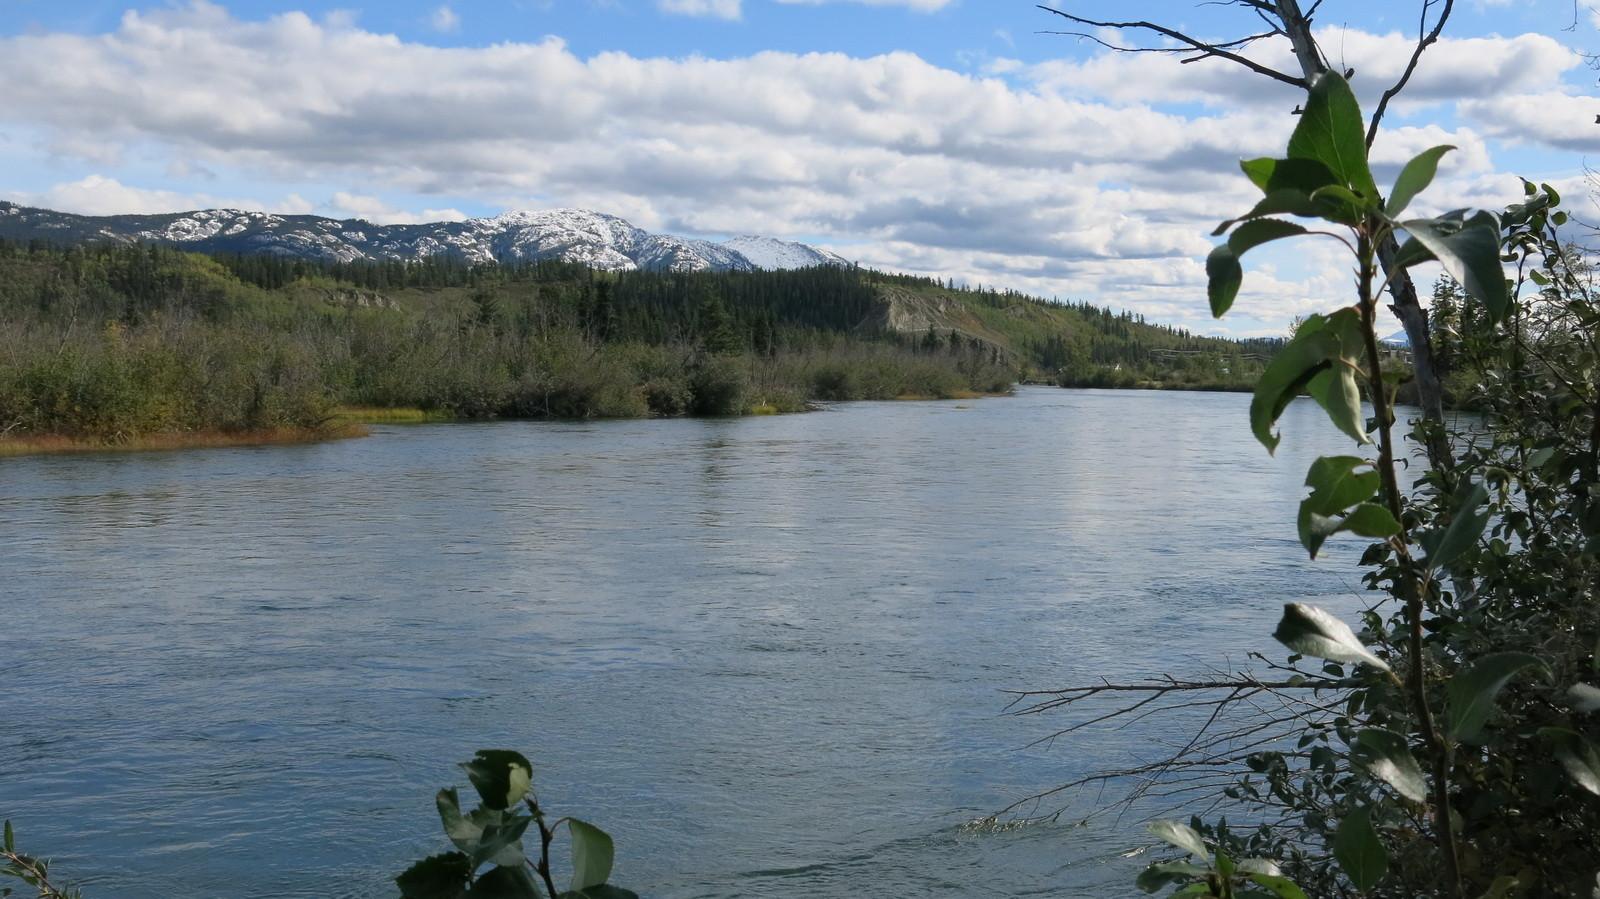 Ein weiteres Foto des Yukon bei Whitehorse.